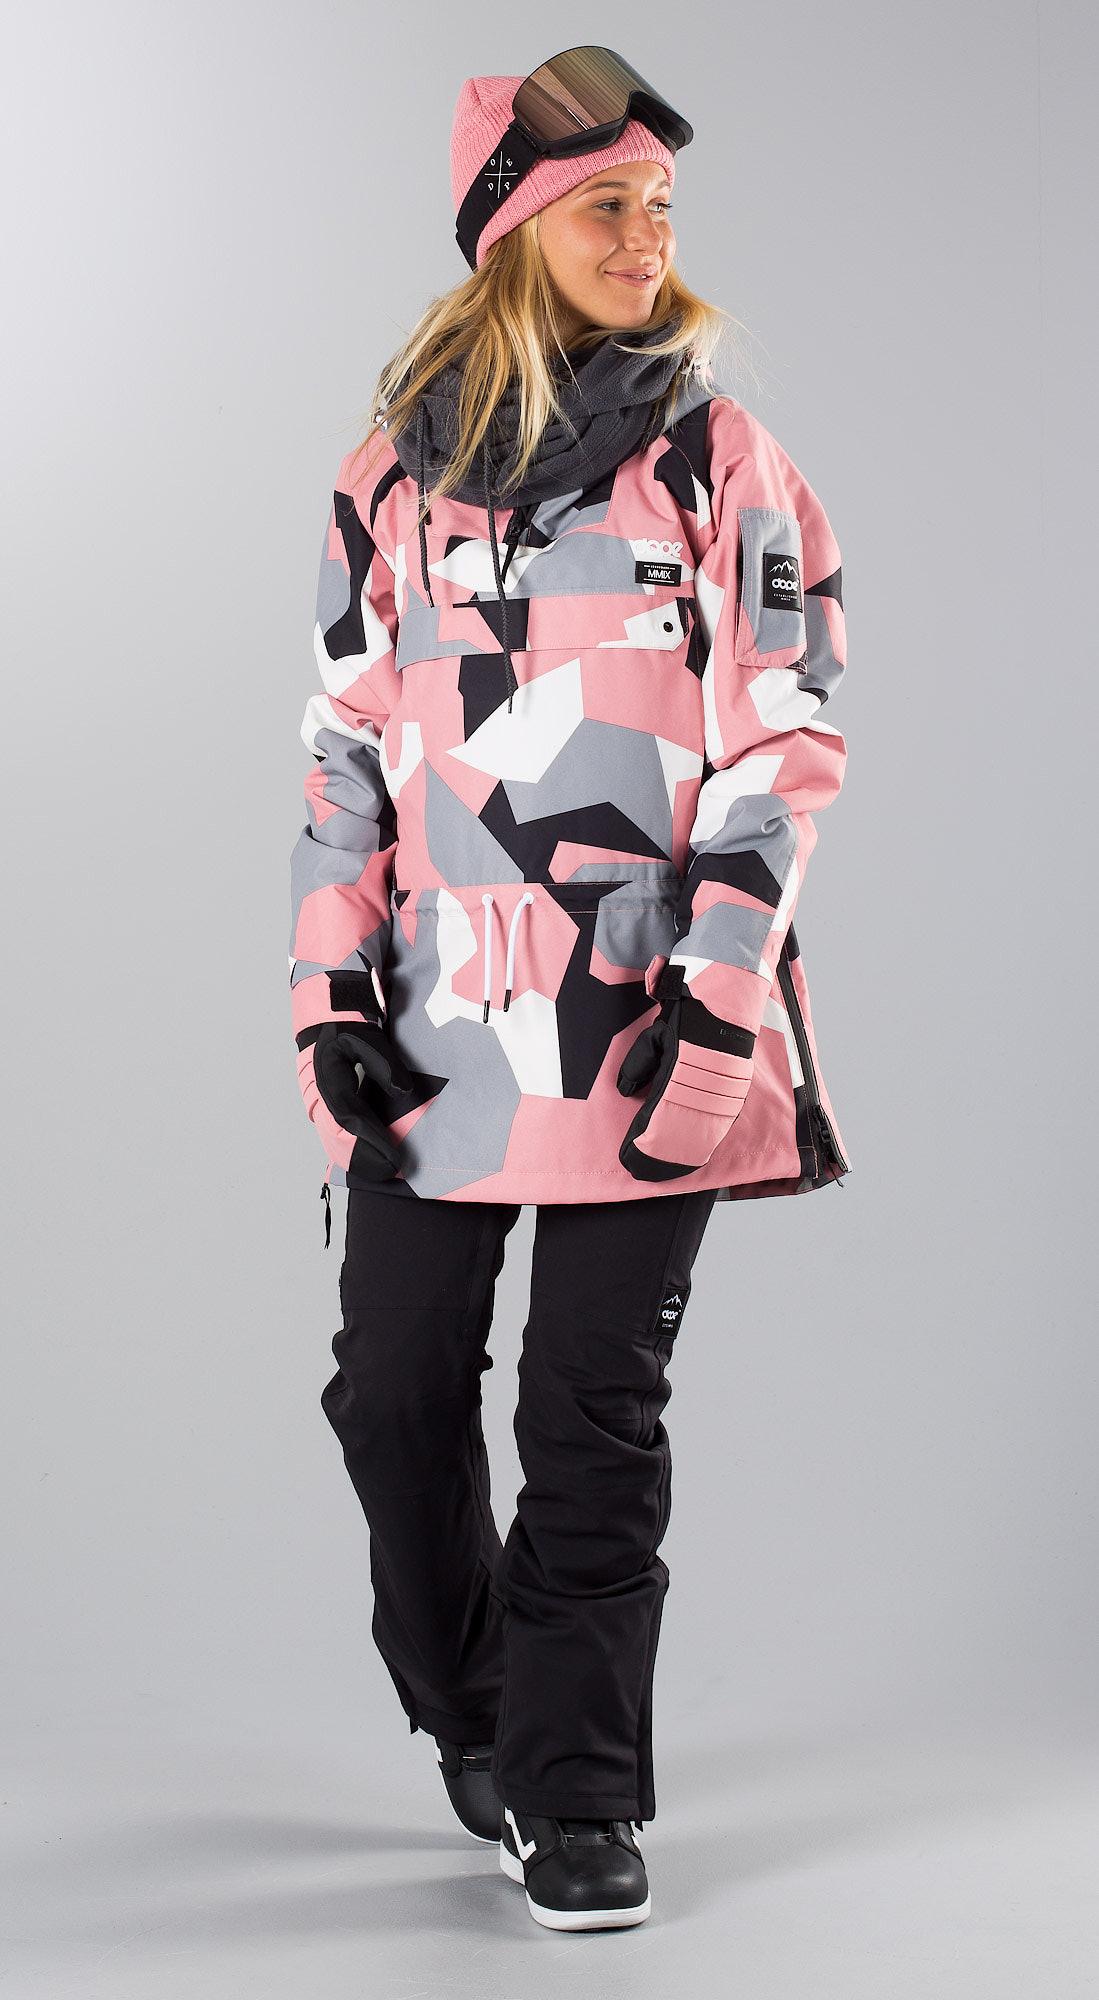 015ca3280c81 Dope Annok W Snowboardjacka Pink Camo - Ridestore.se